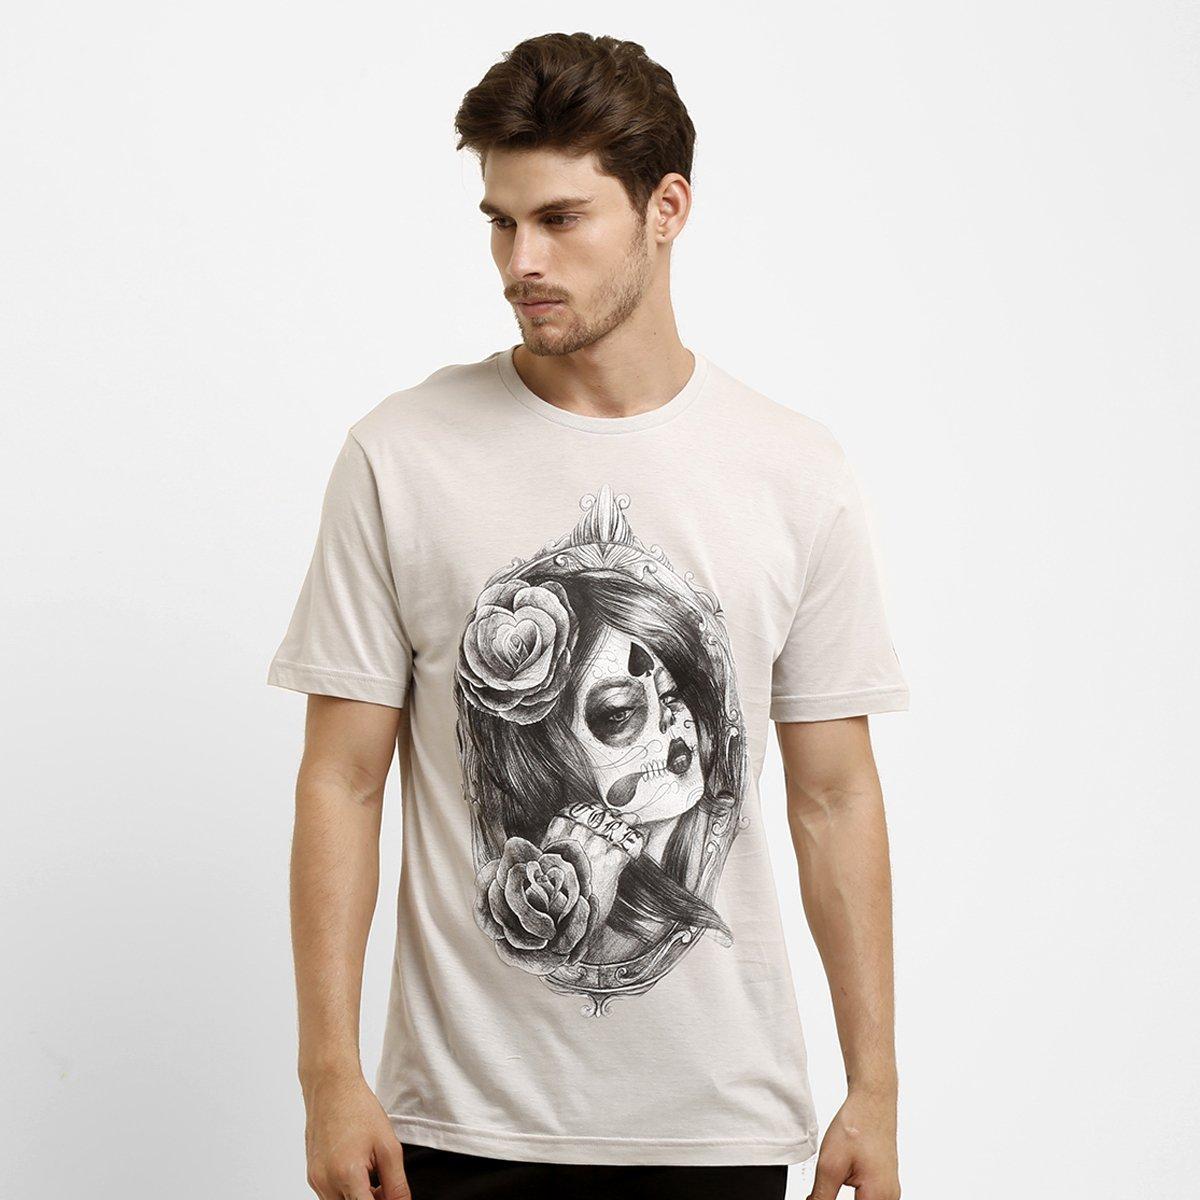 cd4f997663614 Camiseta MCD Santa Muerte - Compre Agora